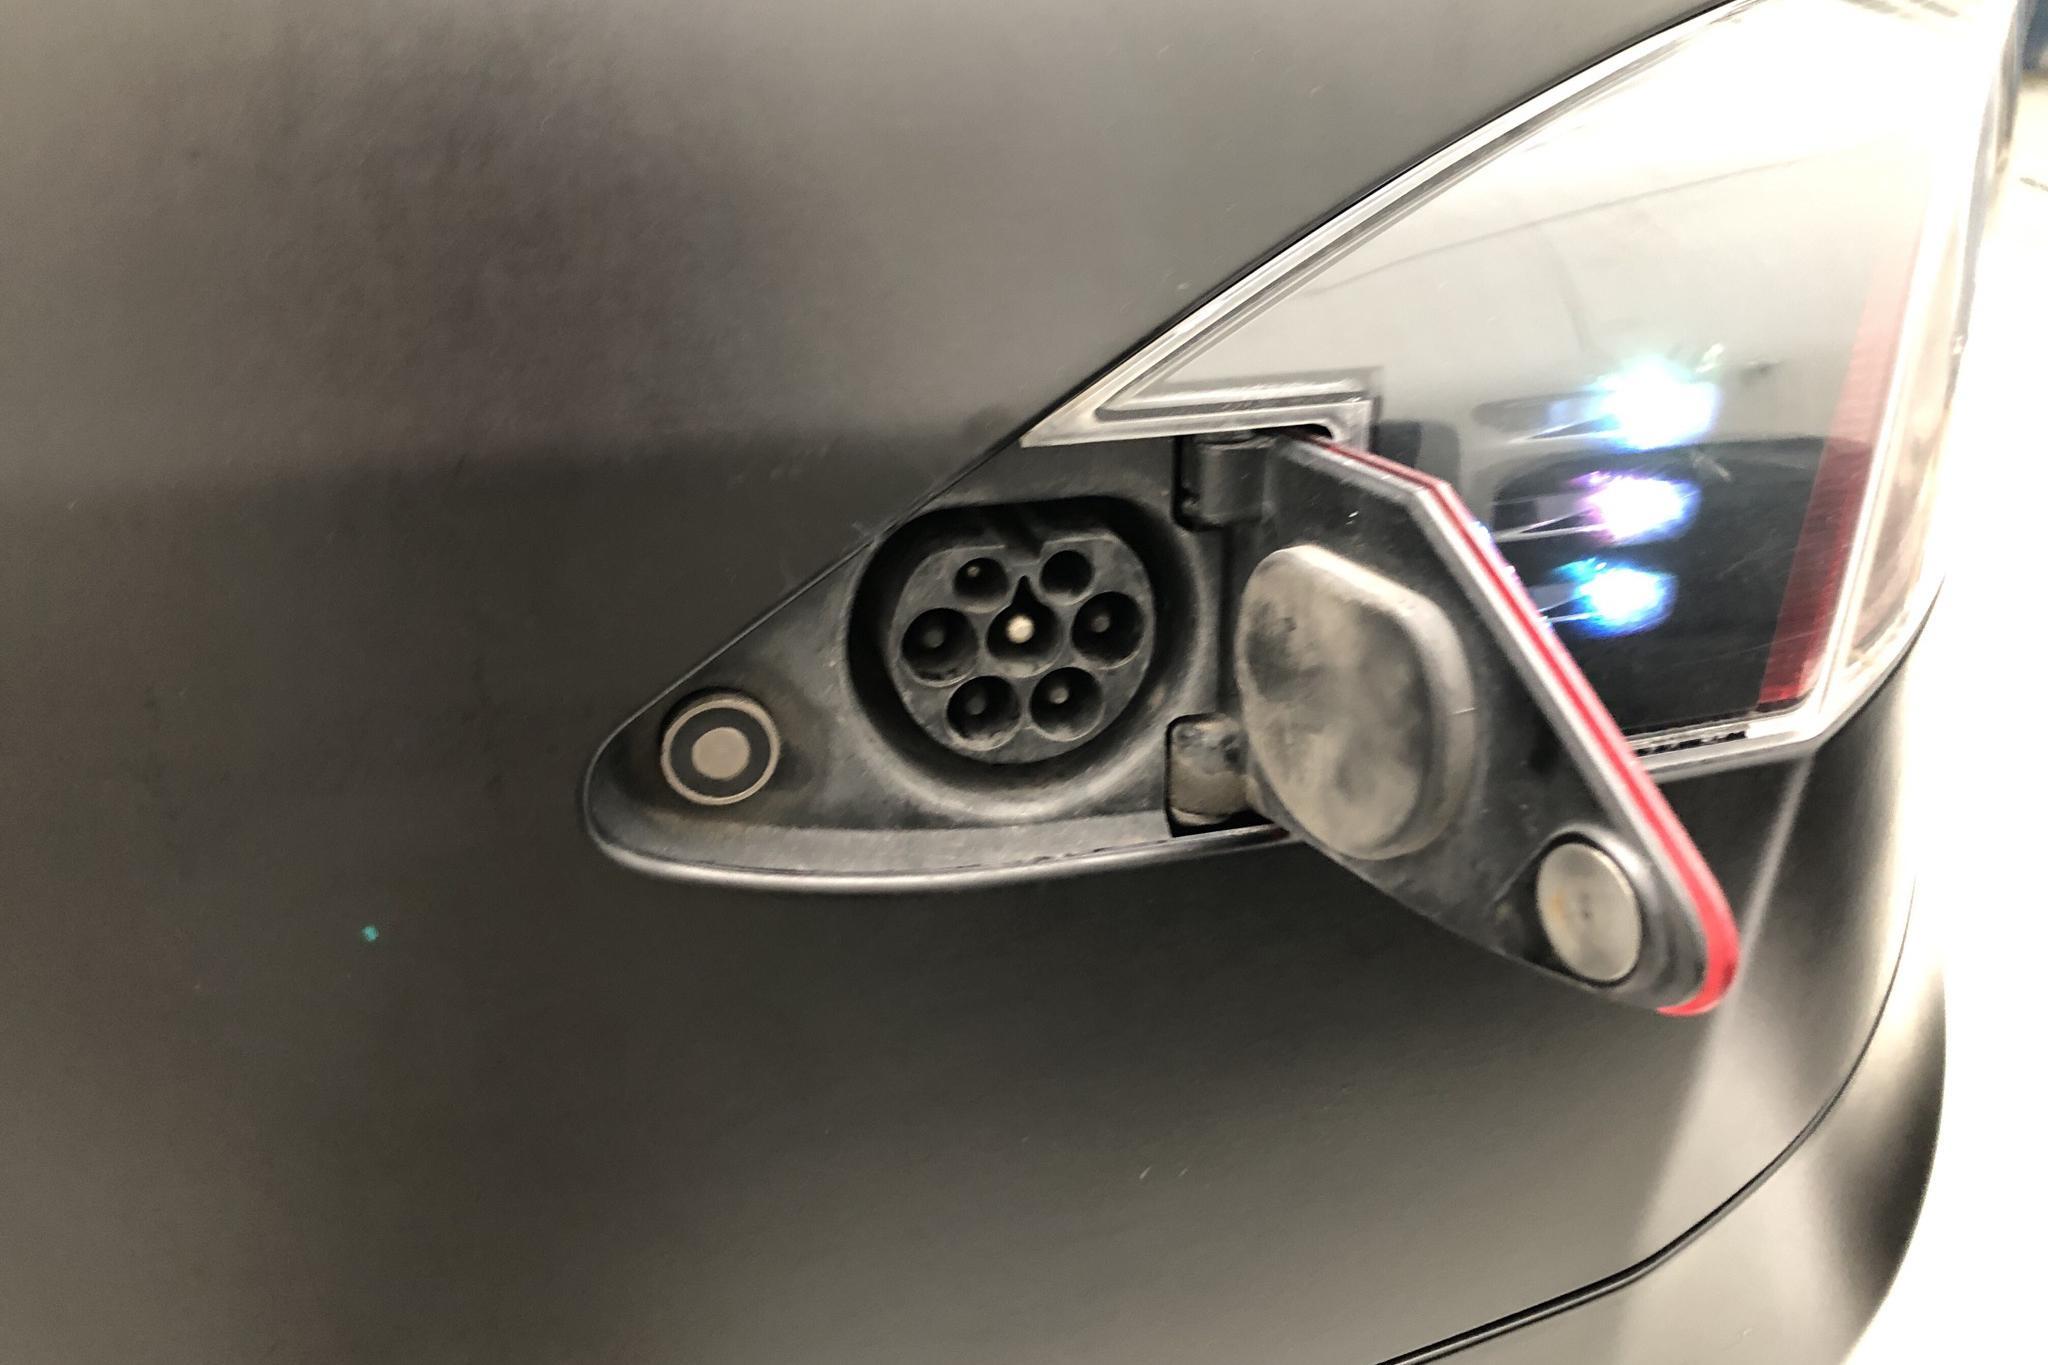 Tesla Model S 85 (367hk) - 138 450 km - Automatic - gray - 2014